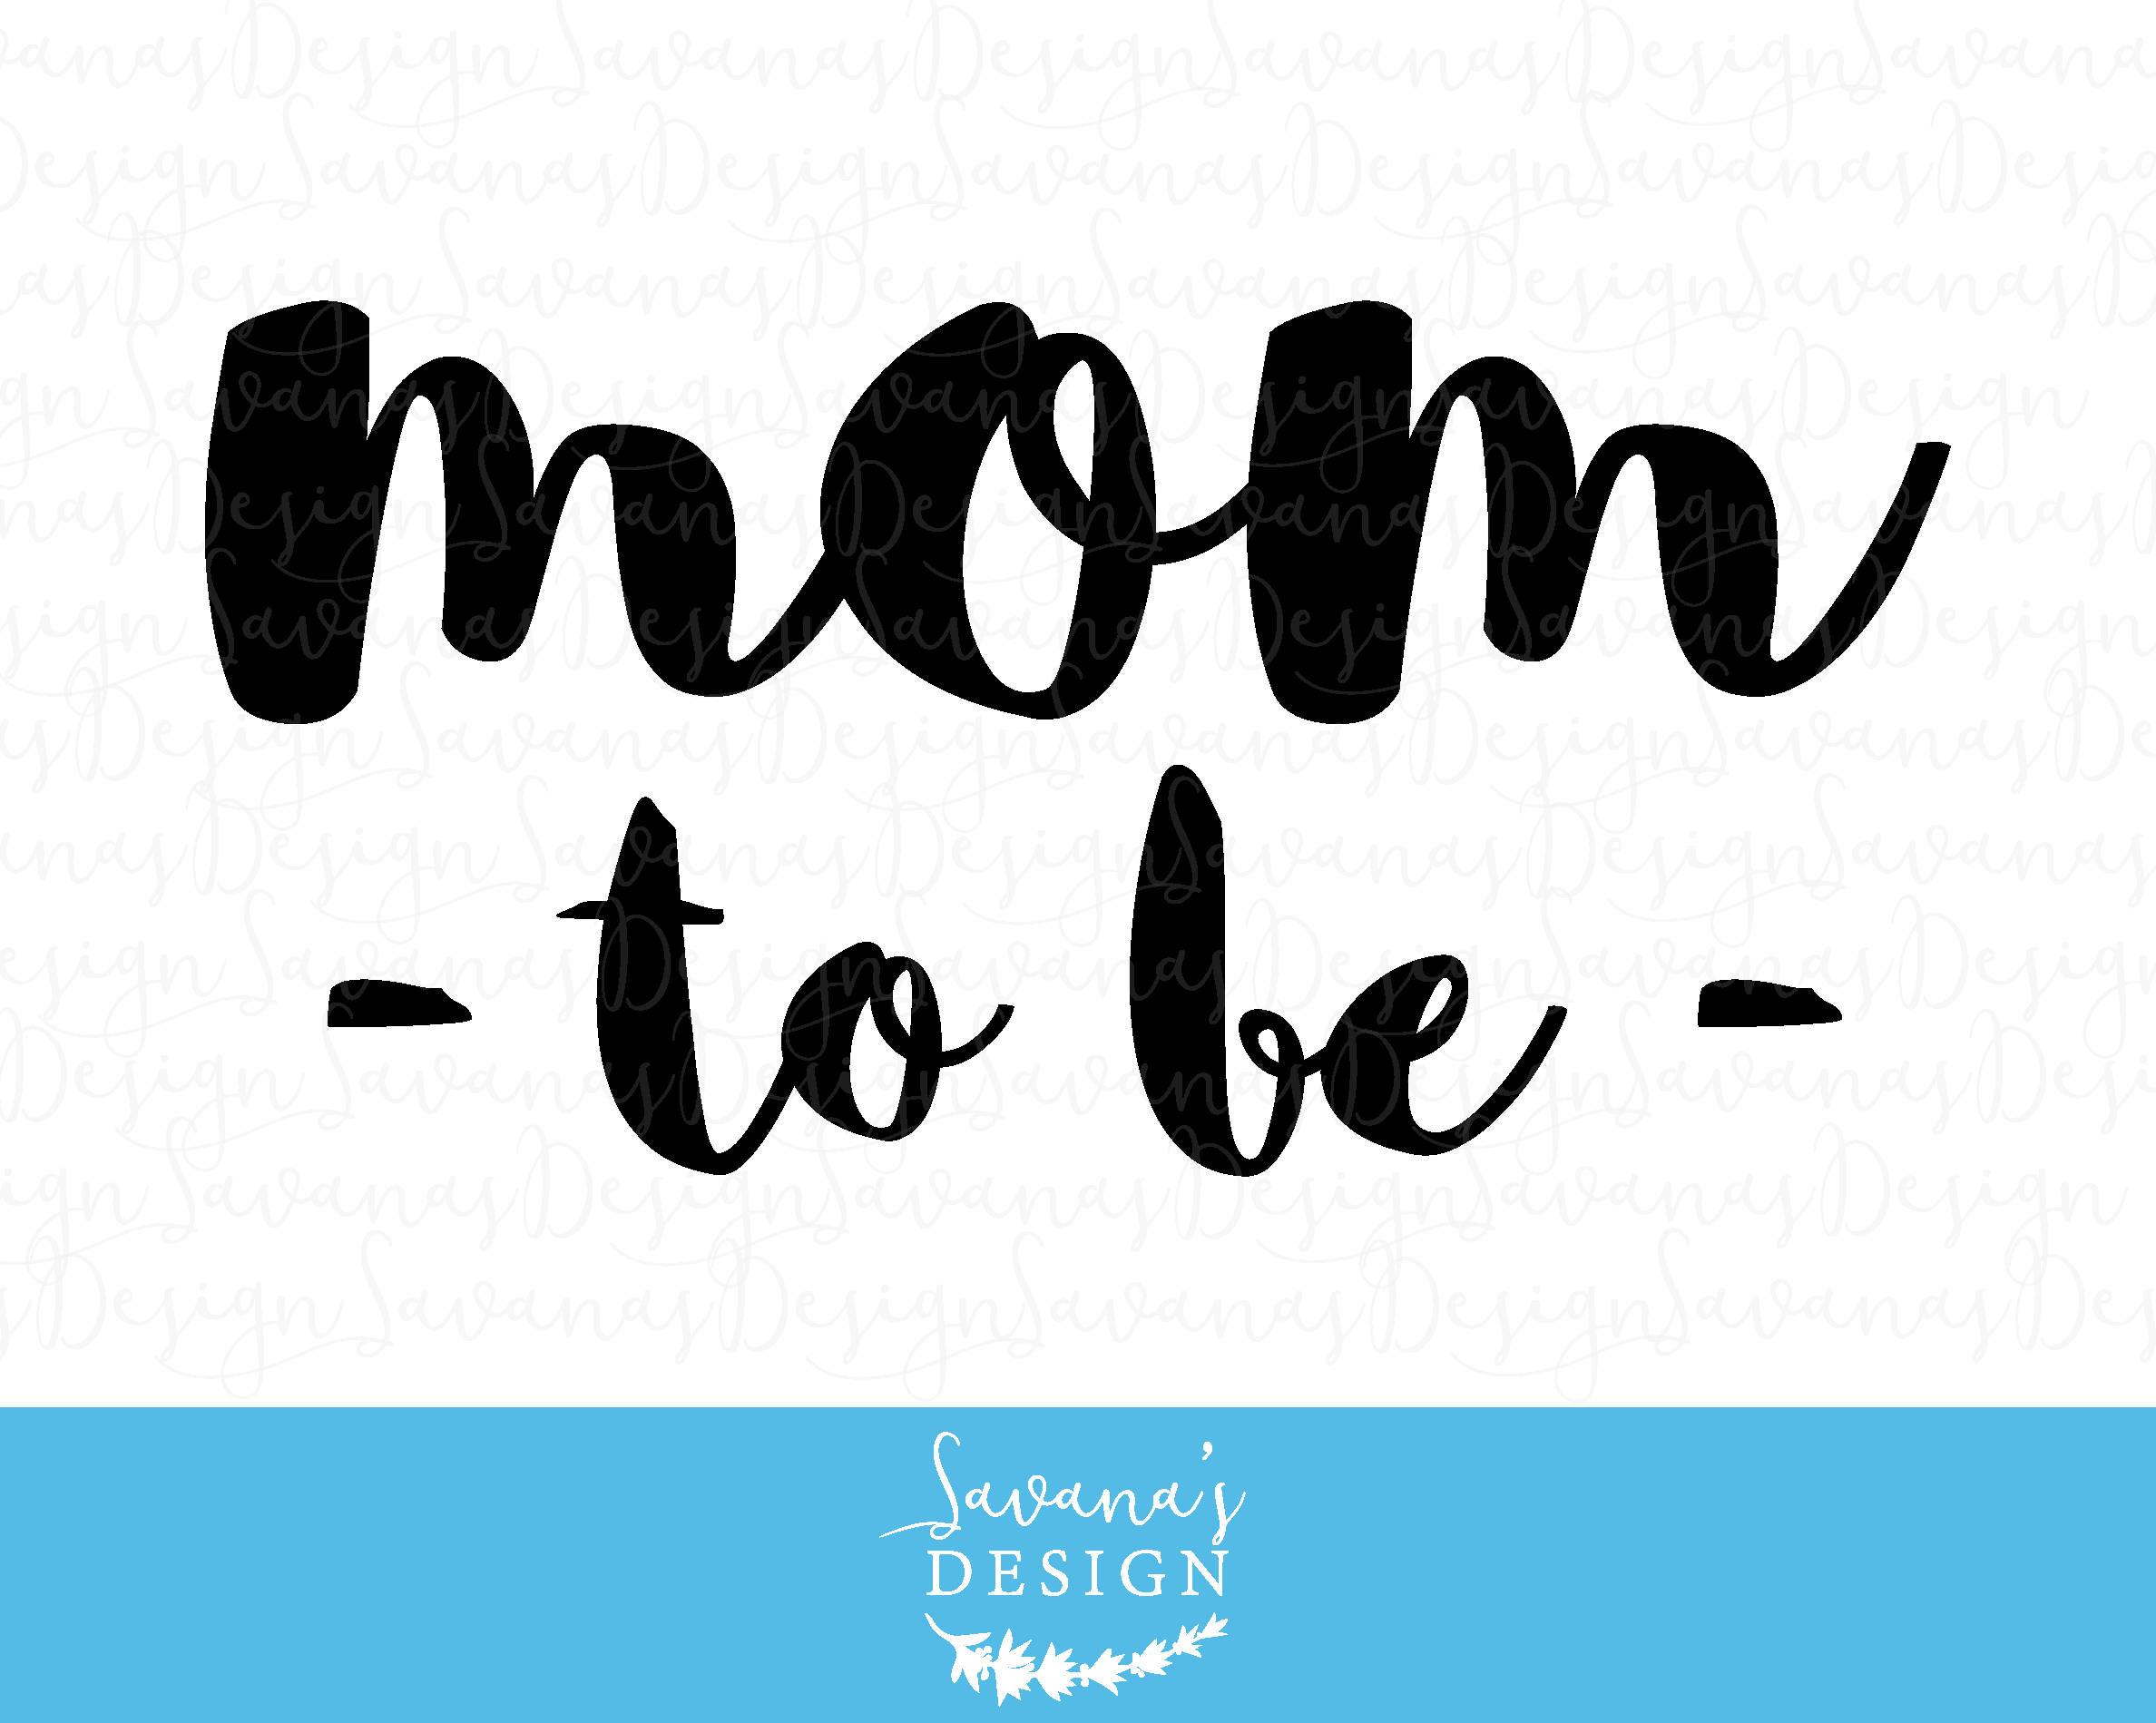 Pregnancy Svg Mommy Svg Baby Svg Pregnant Svg Mommy To Be: Mom To Be SVG Mom SVG Pregnant SVG Mom Cut Files Mom Svg